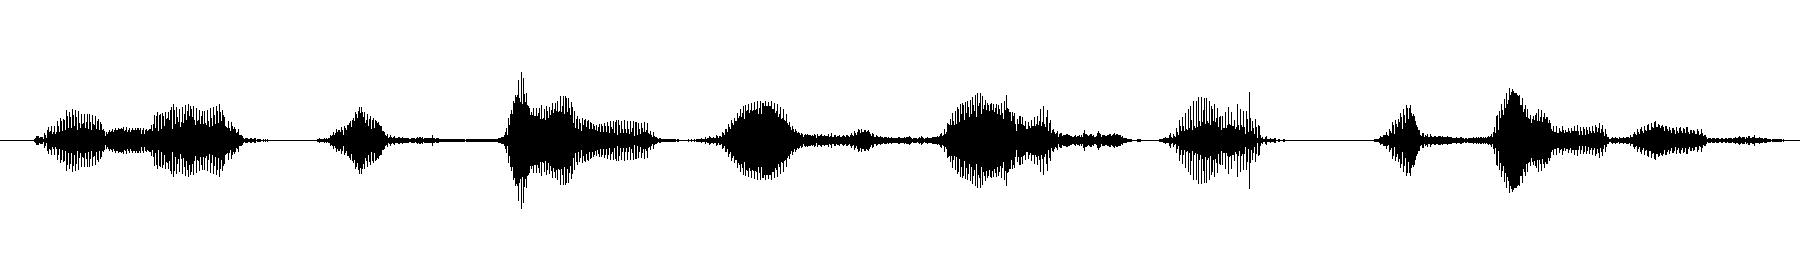 fl hrao 90bpm microphone